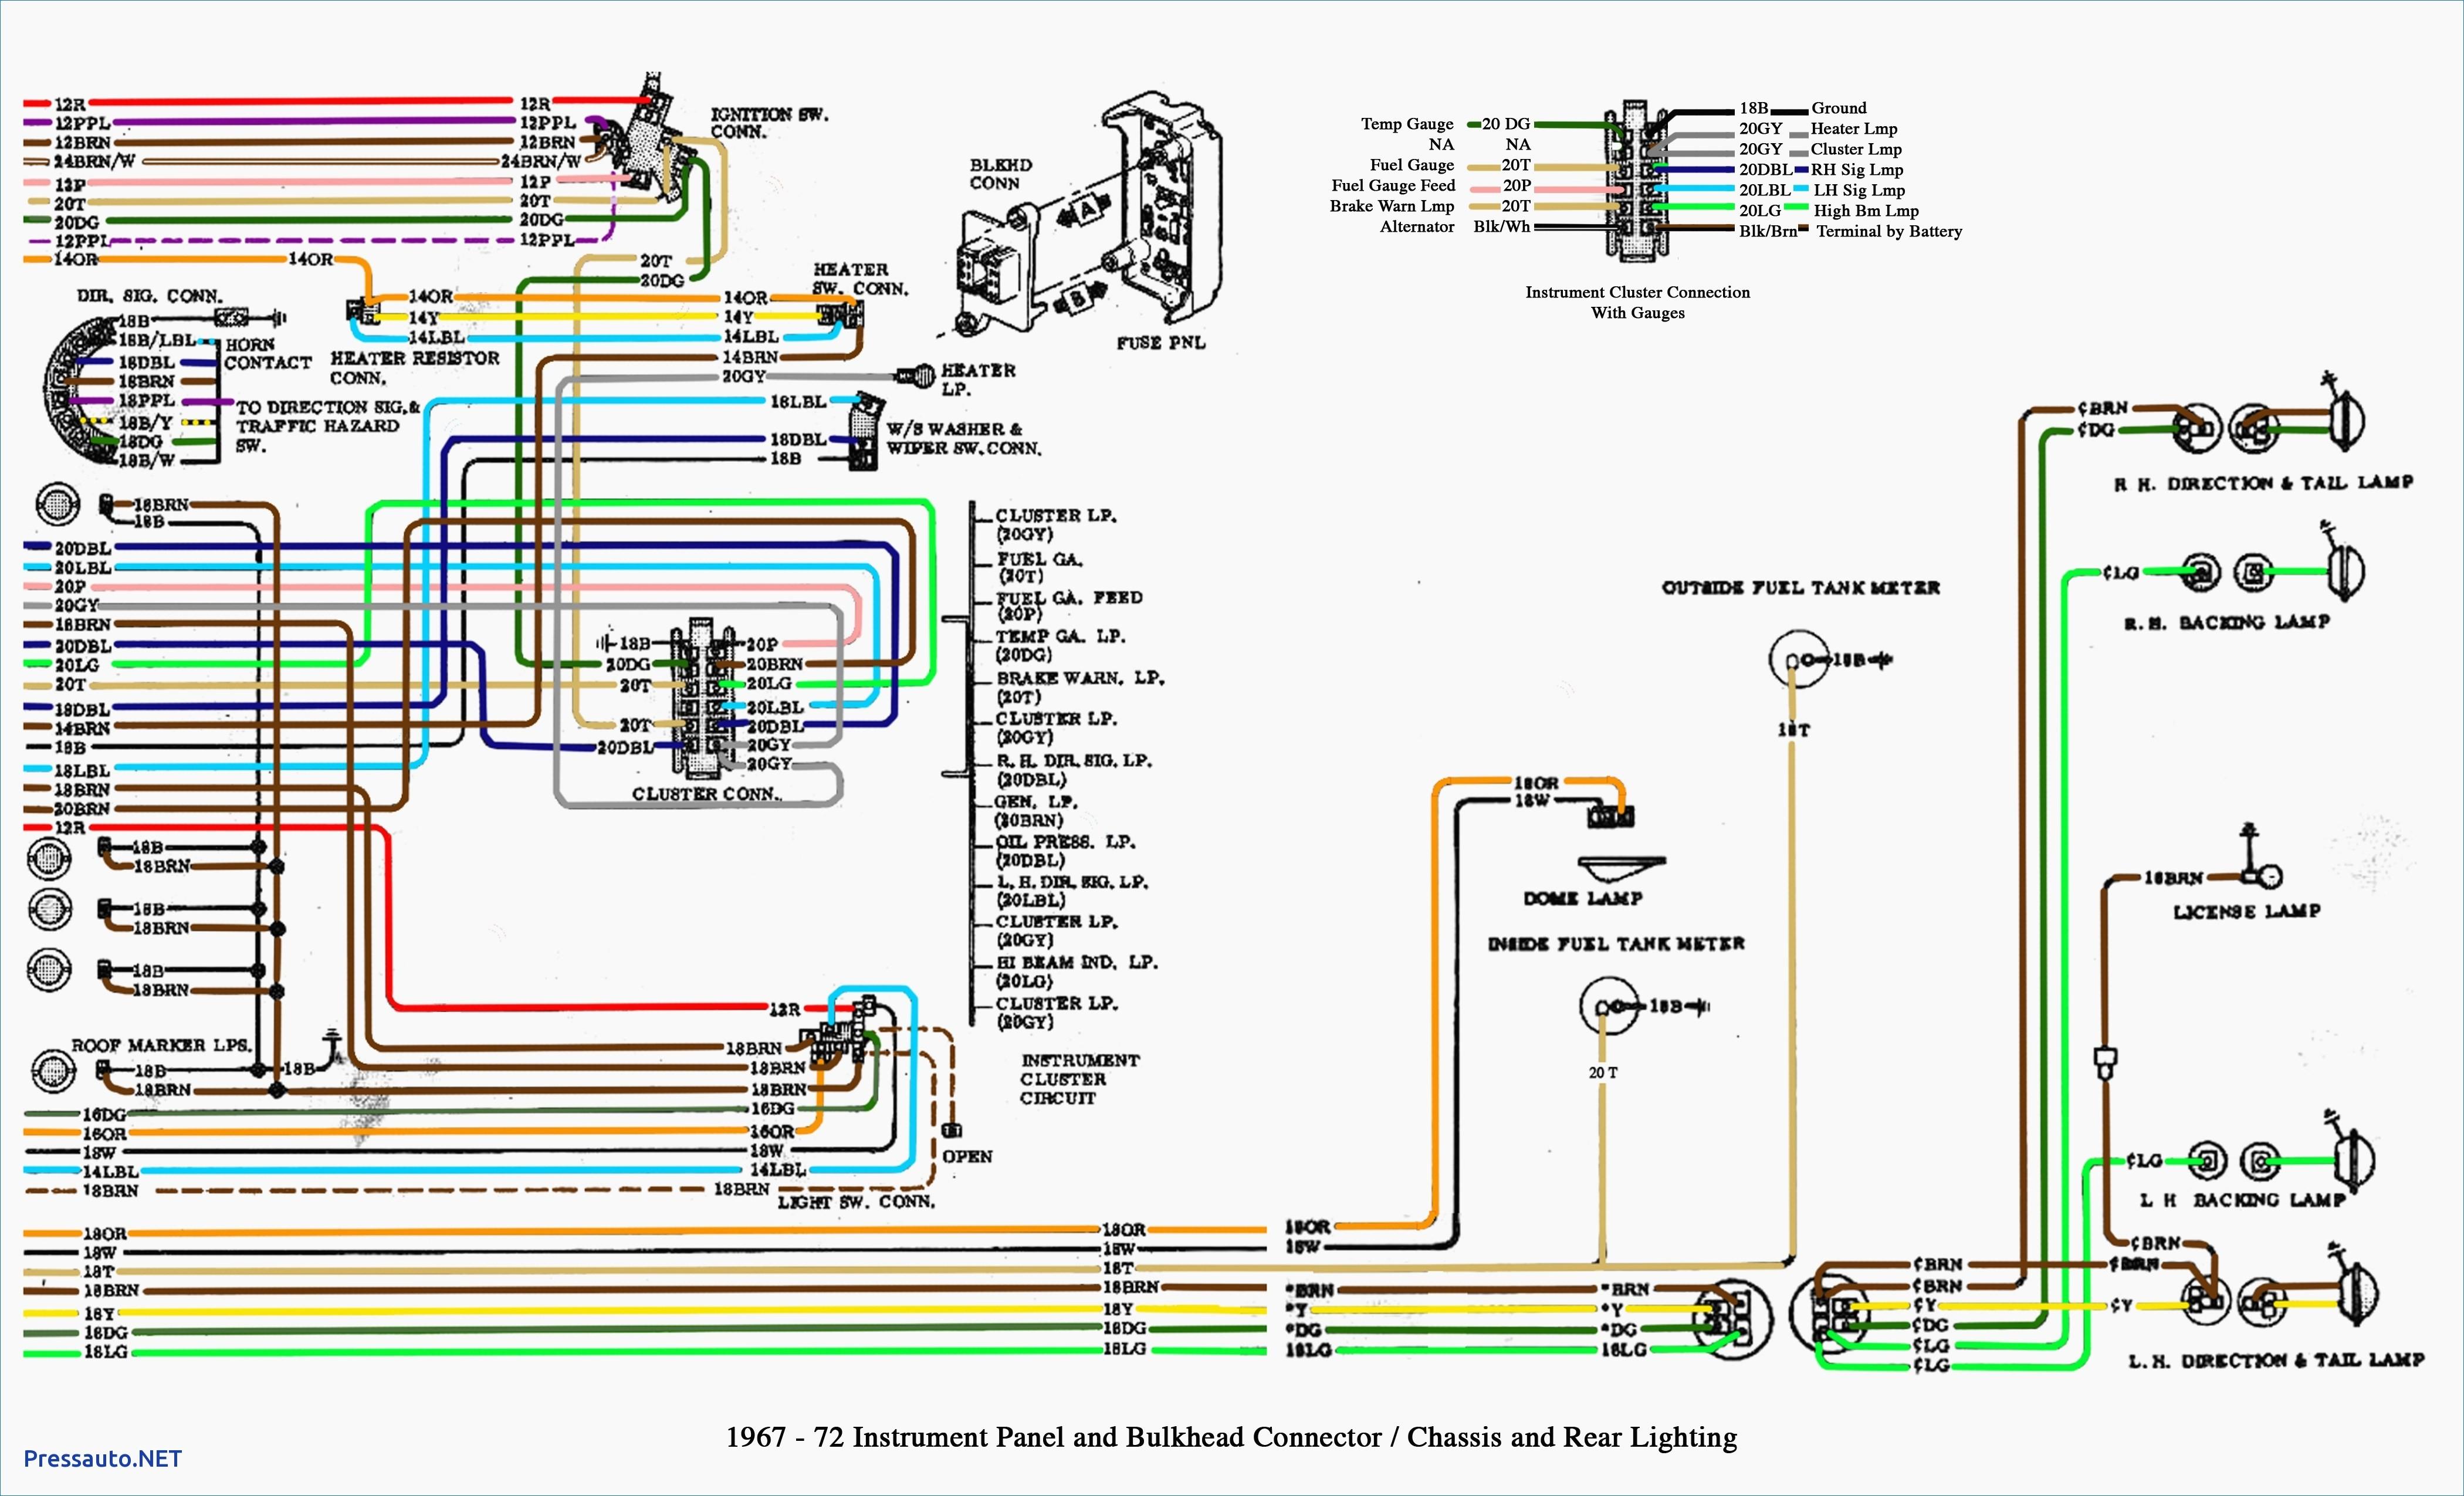 DIAGRAM] Chevy Equinox Stereo Wiring Diagram FULL Version HD Quality Wiring  Diagram - SOAPBOXDIAGRAM.SAPORITE.ITDiagram Database - saporite.it